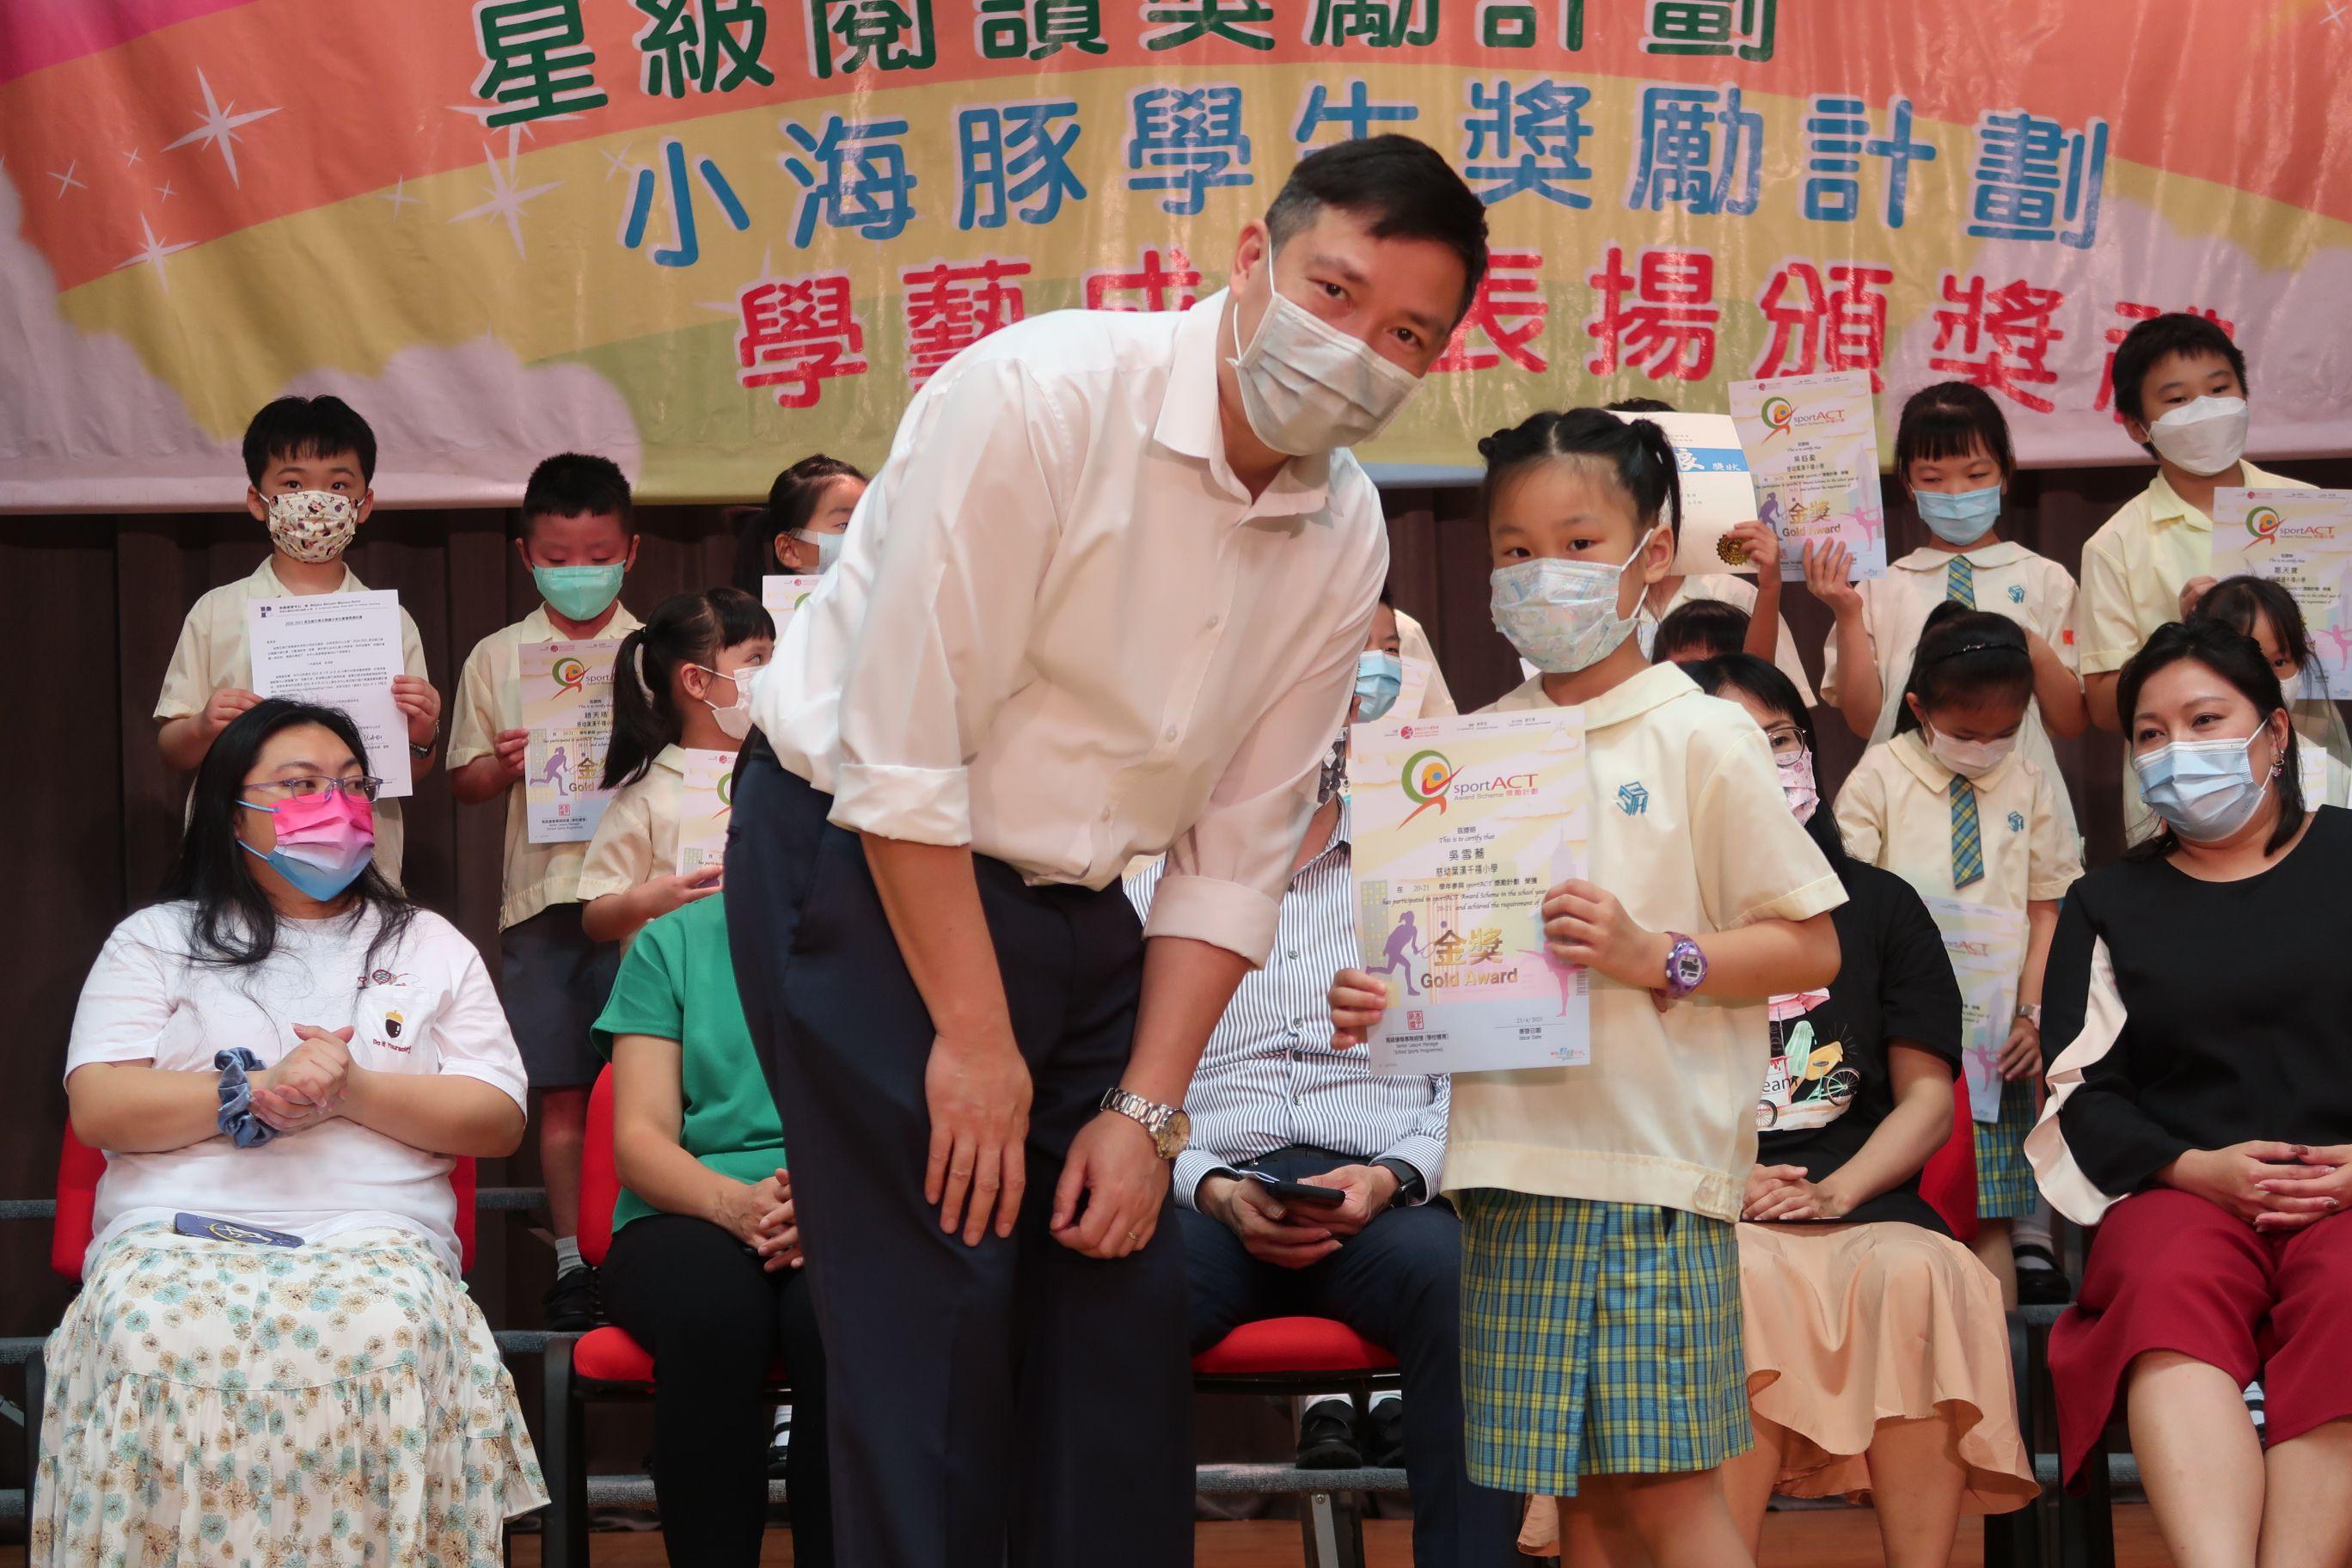 https://syh.edu.hk/sites/default/files/img_5912.jpg